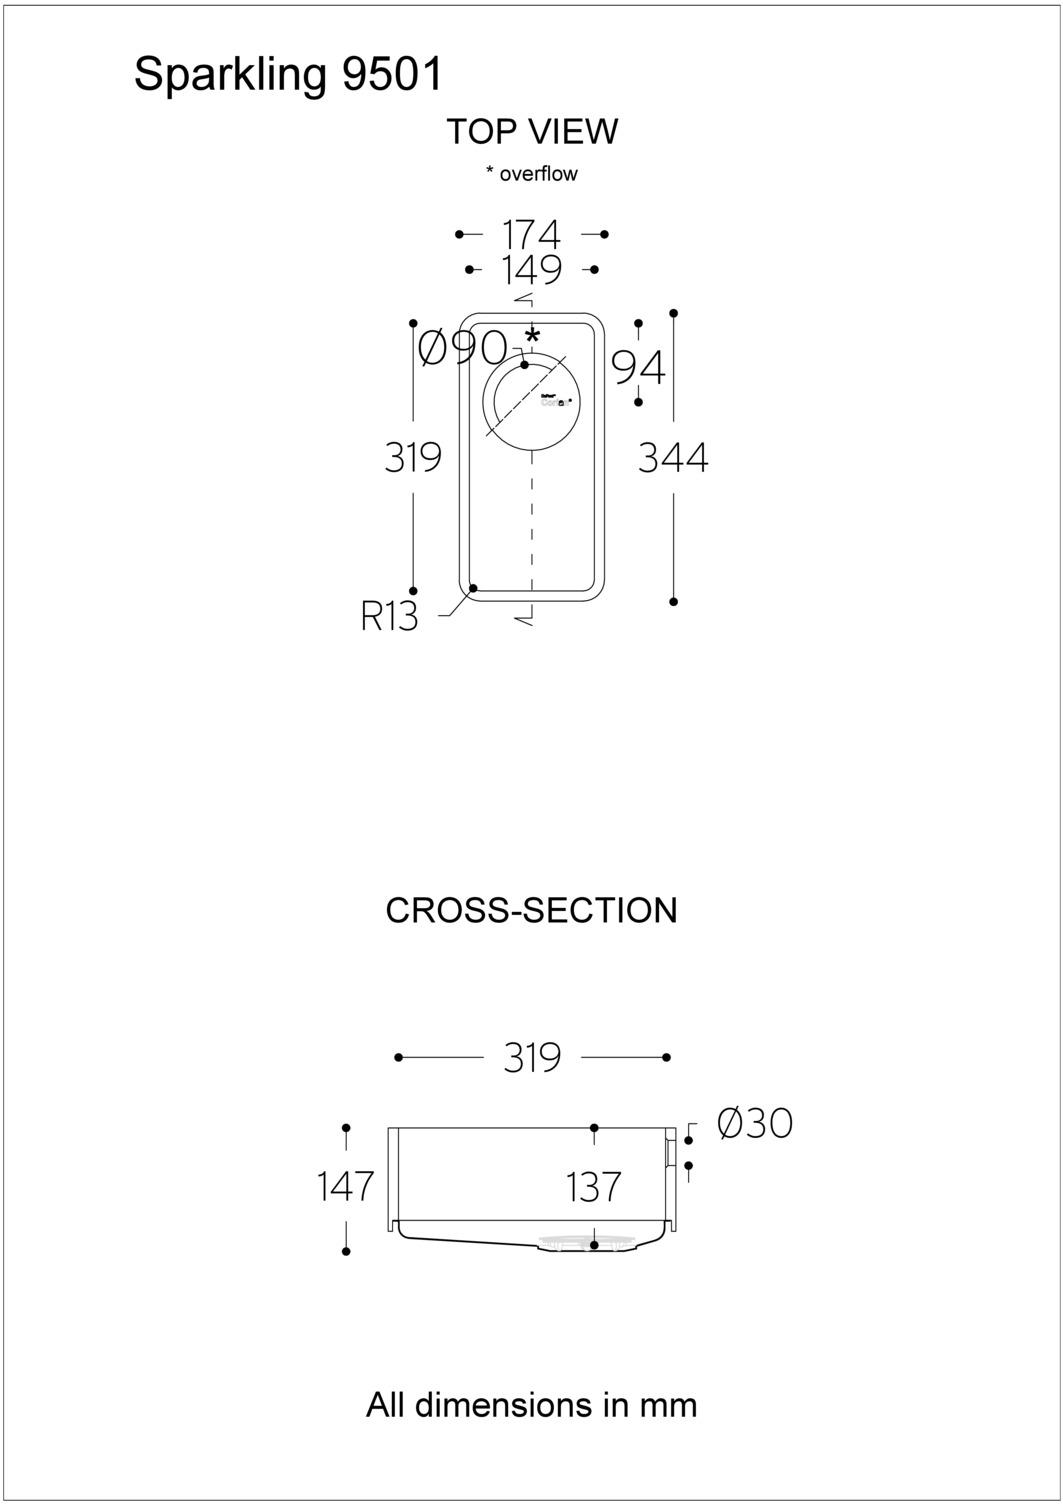 DUPONT_CORIAN_SPARKLING9501_2D_PDF[0]